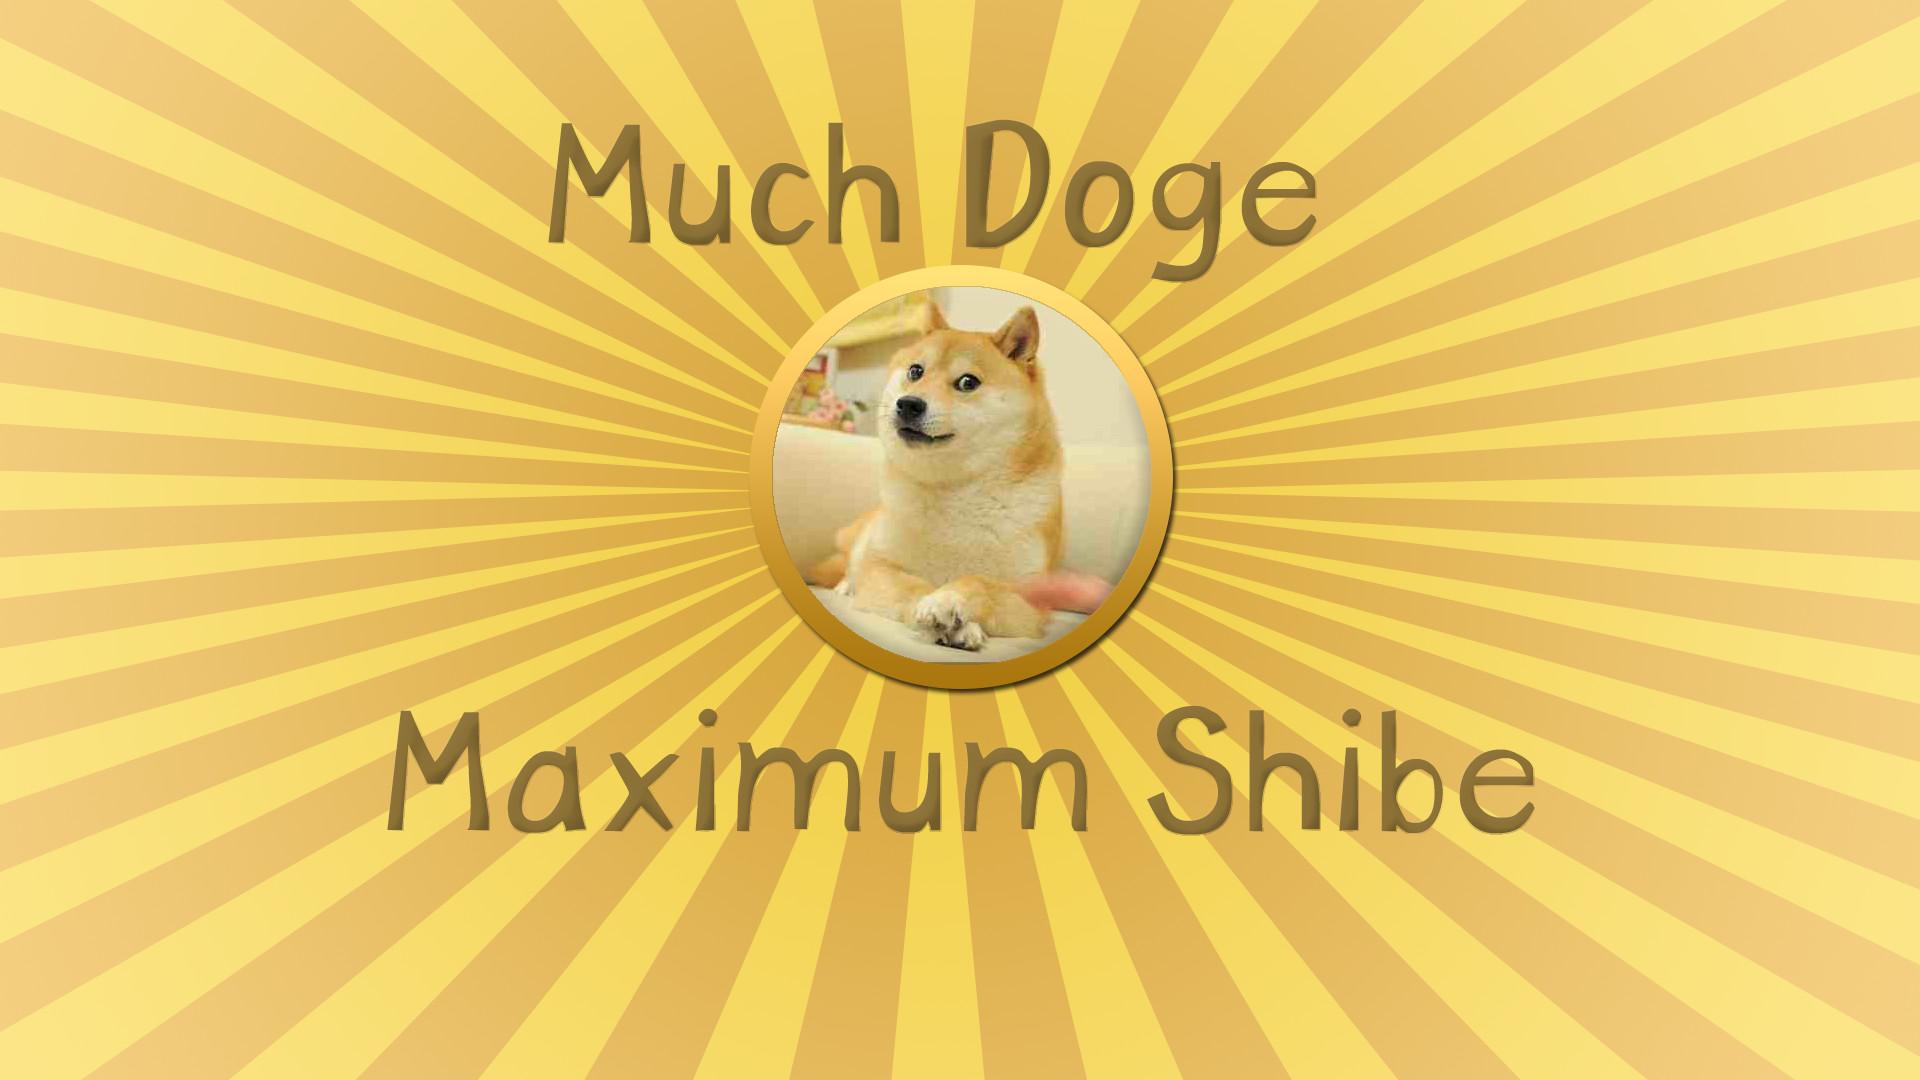 Doge wallpaper | Memes doe | Pinterest | Wallpapers, Meme and Doge